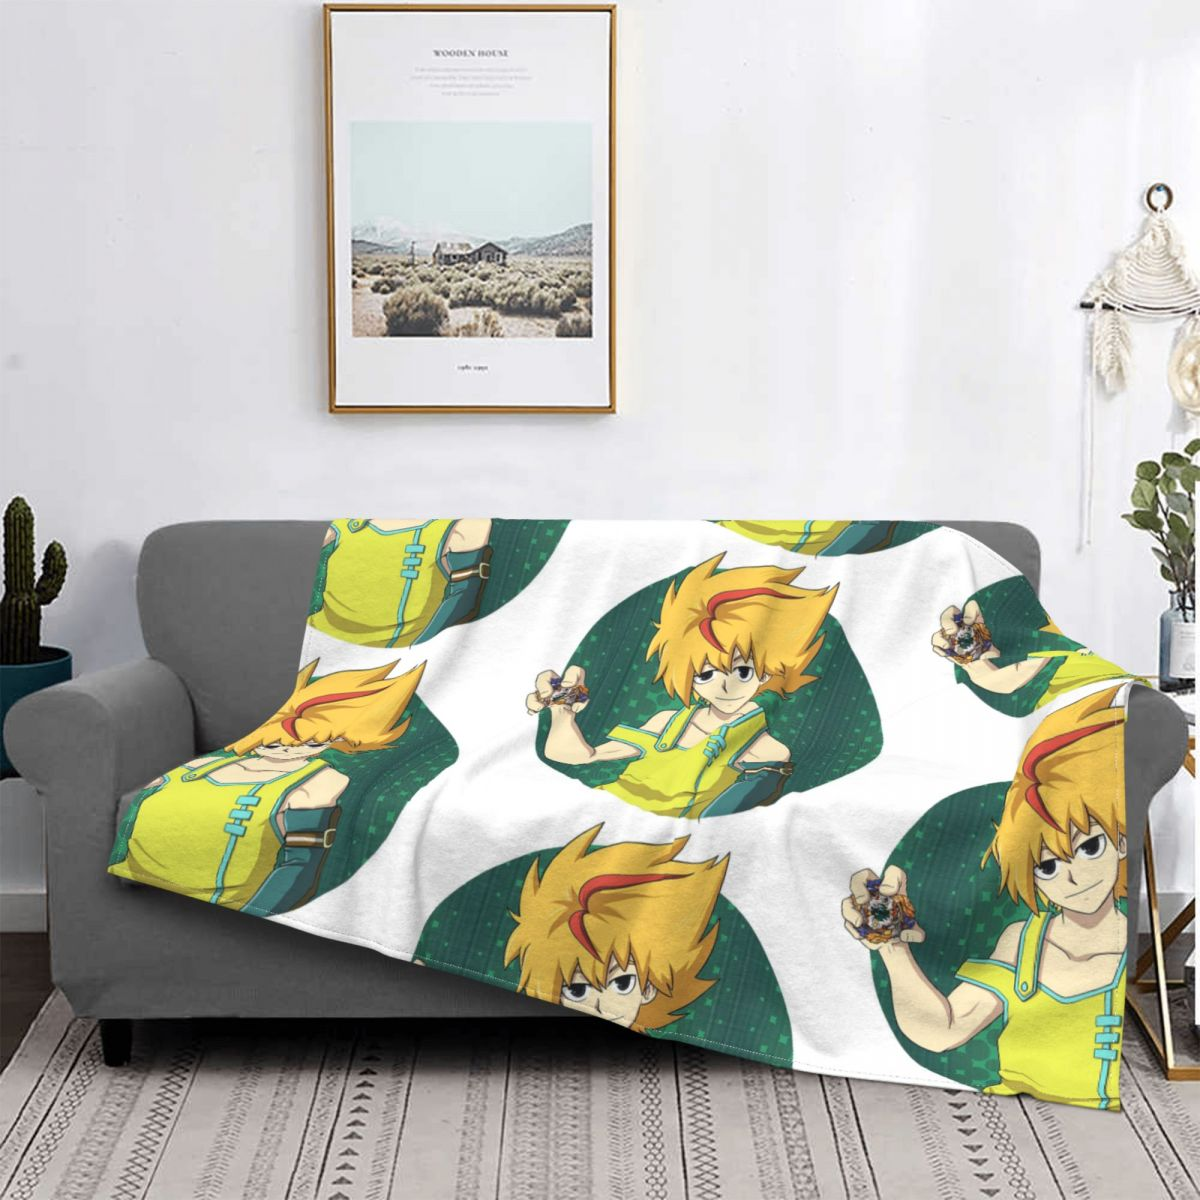 Beyblade انفجار السجاد غرفة المعيشة يتدفقون النسيج بطانية سرير ساخن أغطية السرير الفاخرة بطانية بطانية الفانيلا بطانية